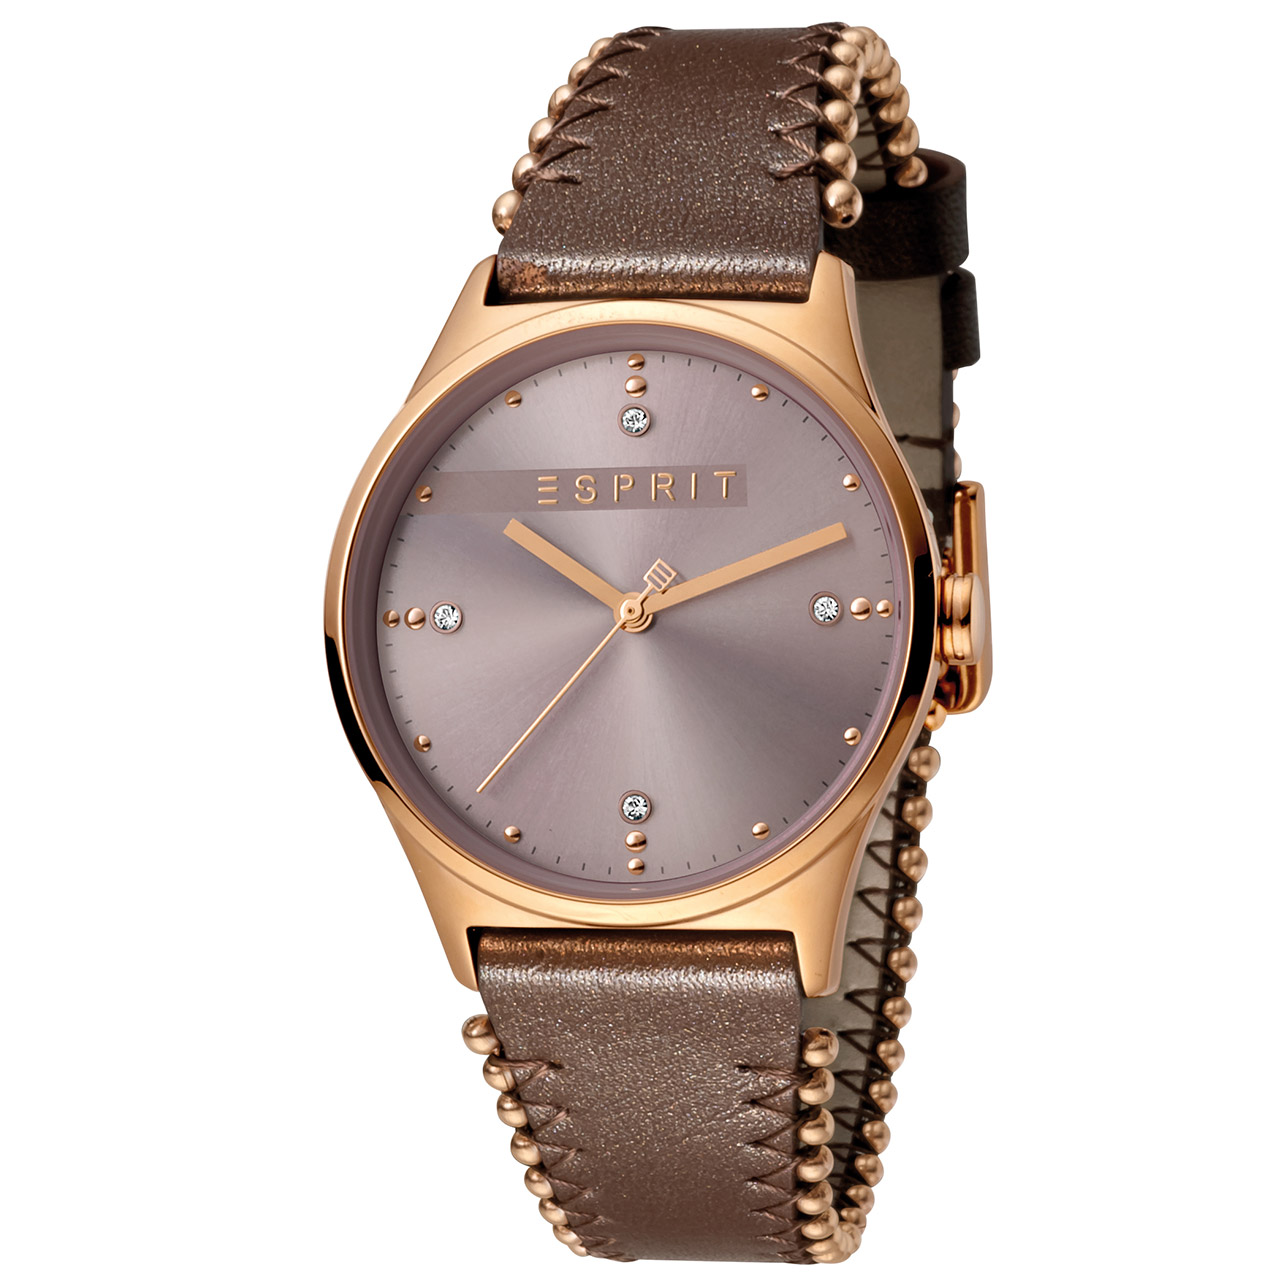 ساعت مچی عقربه ای زنانه اسپریت مدل ES1L032L0045 36